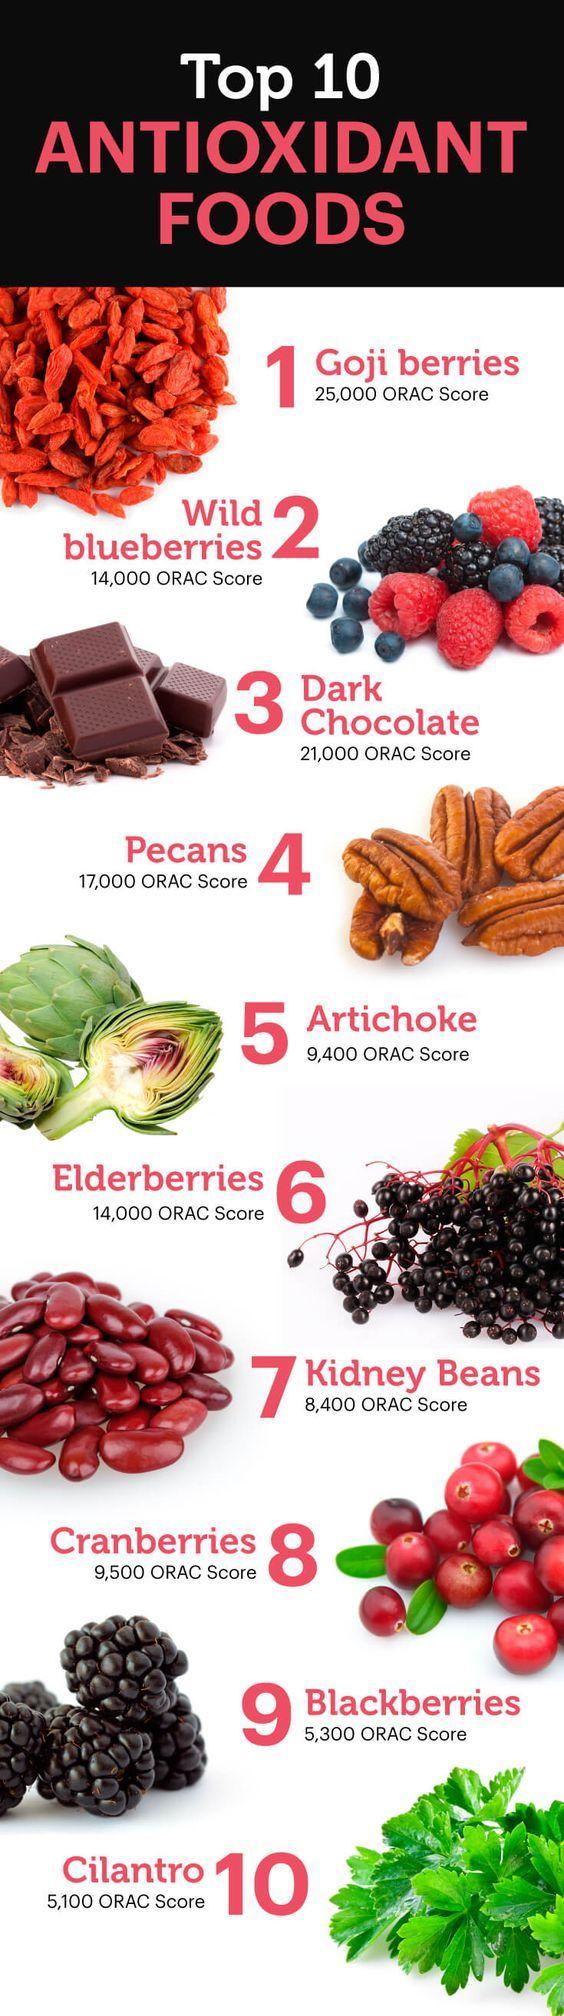 Antioxidants Health Benefits